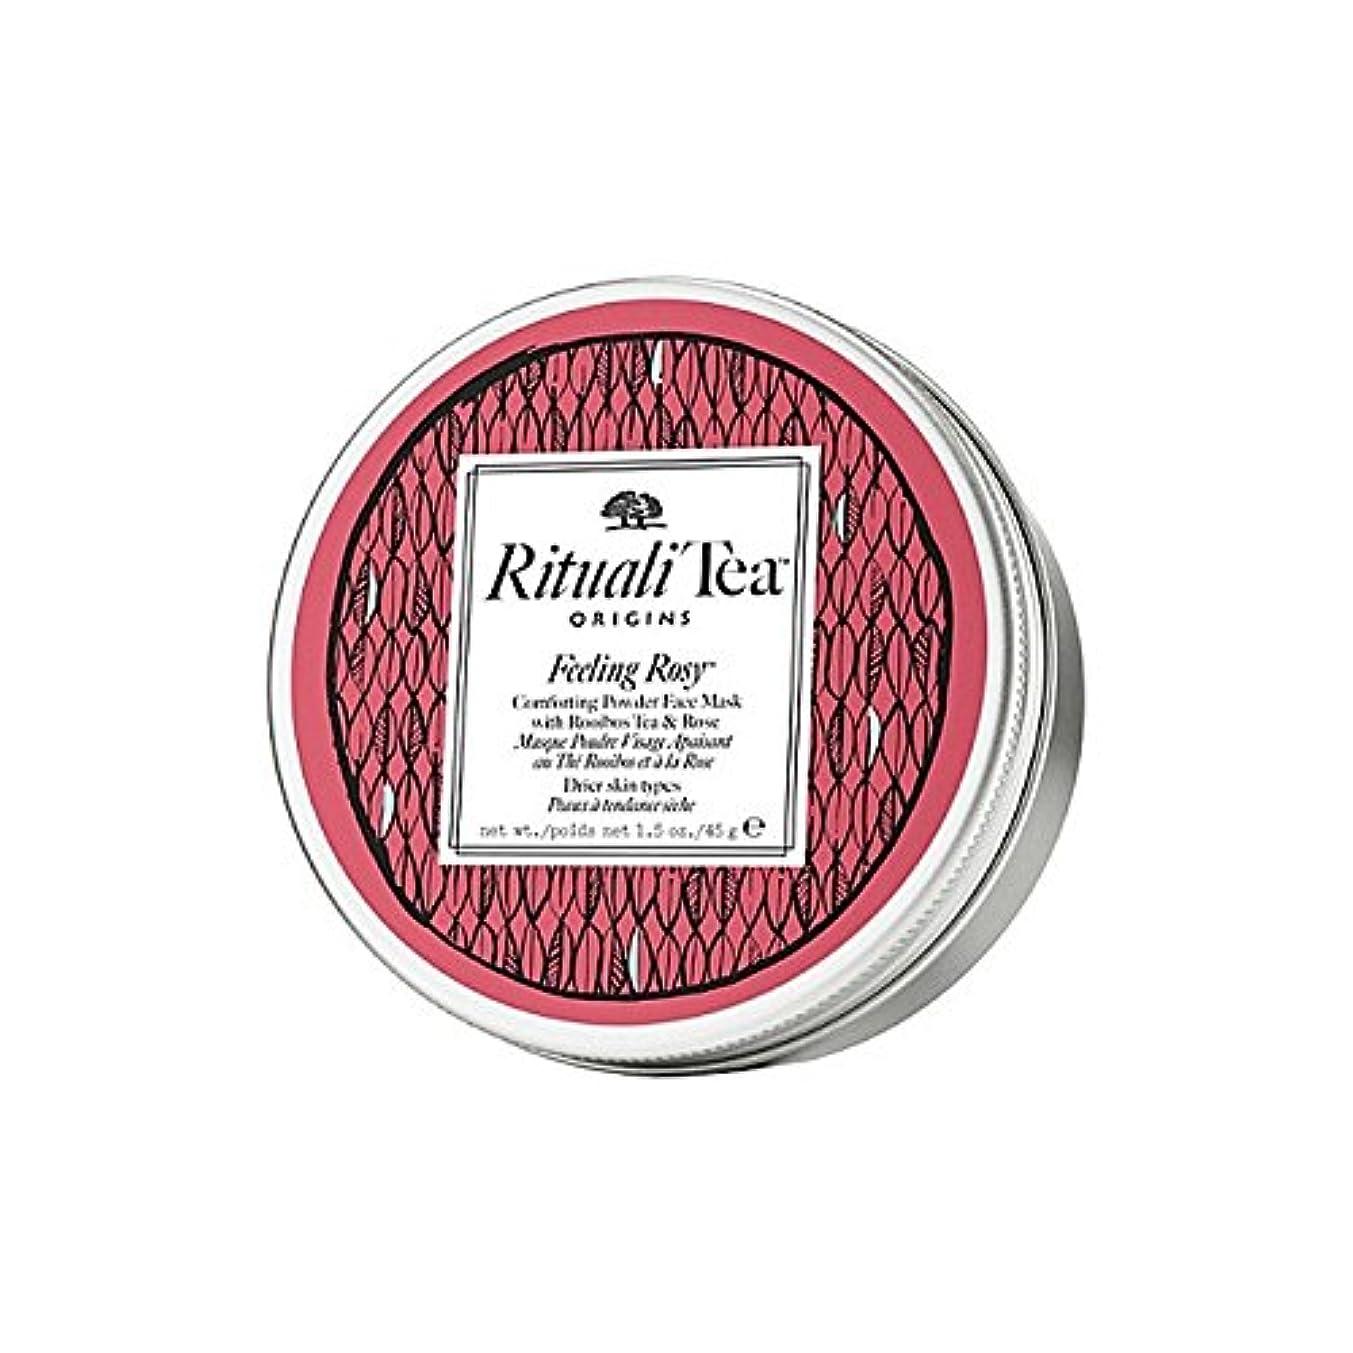 Origins Ritualitea Feeling Rosy Face Mask (Pack of 6) - バラ色のフェイスマスクを感じ起源 x6 [並行輸入品]